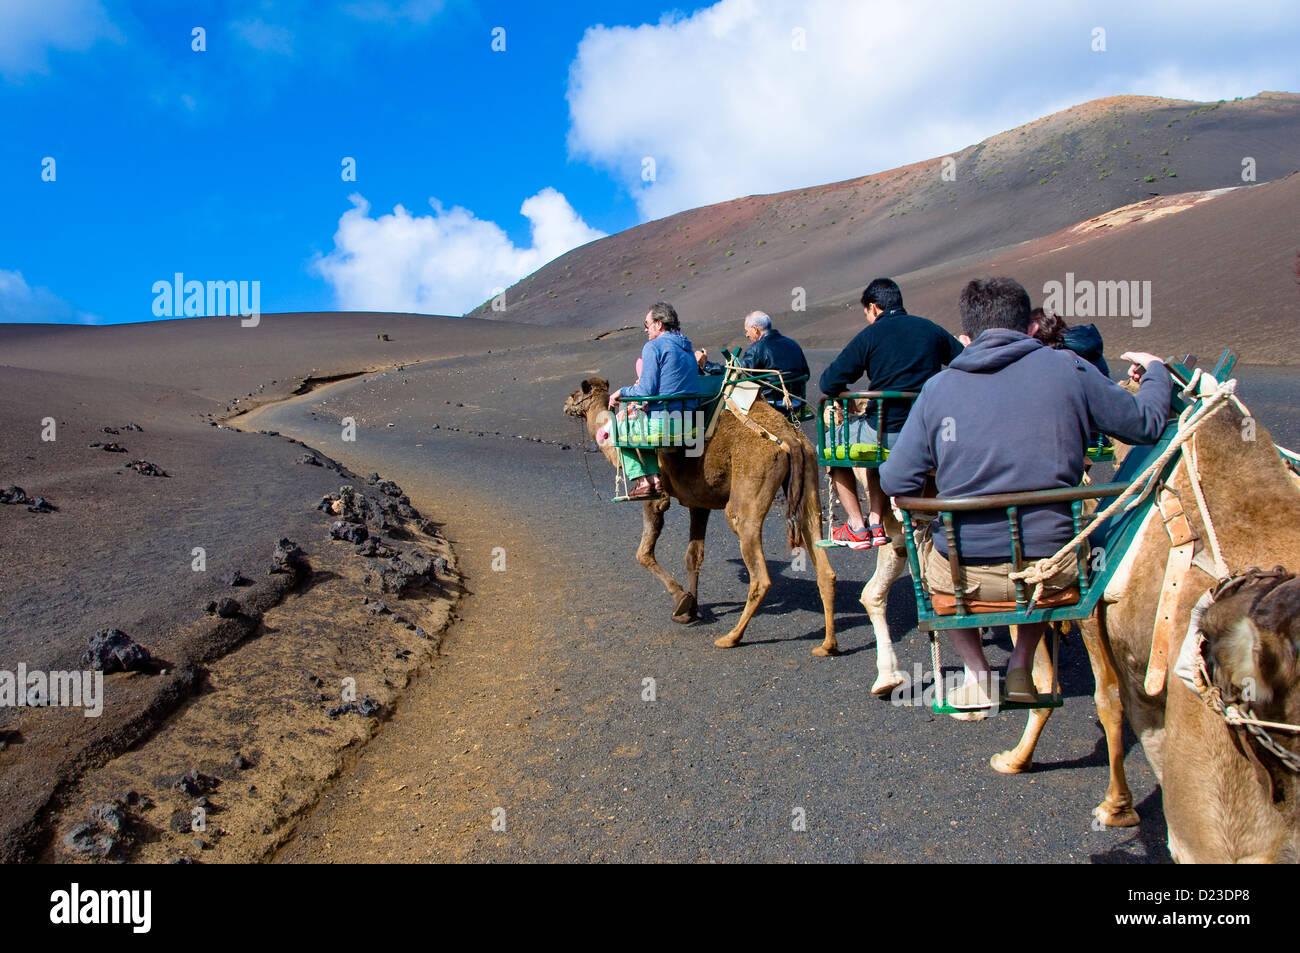 Kamel-Safari, Nationalpark Timanfaya, Lanzarote, Kanarische Inseln, Spanien Stockbild